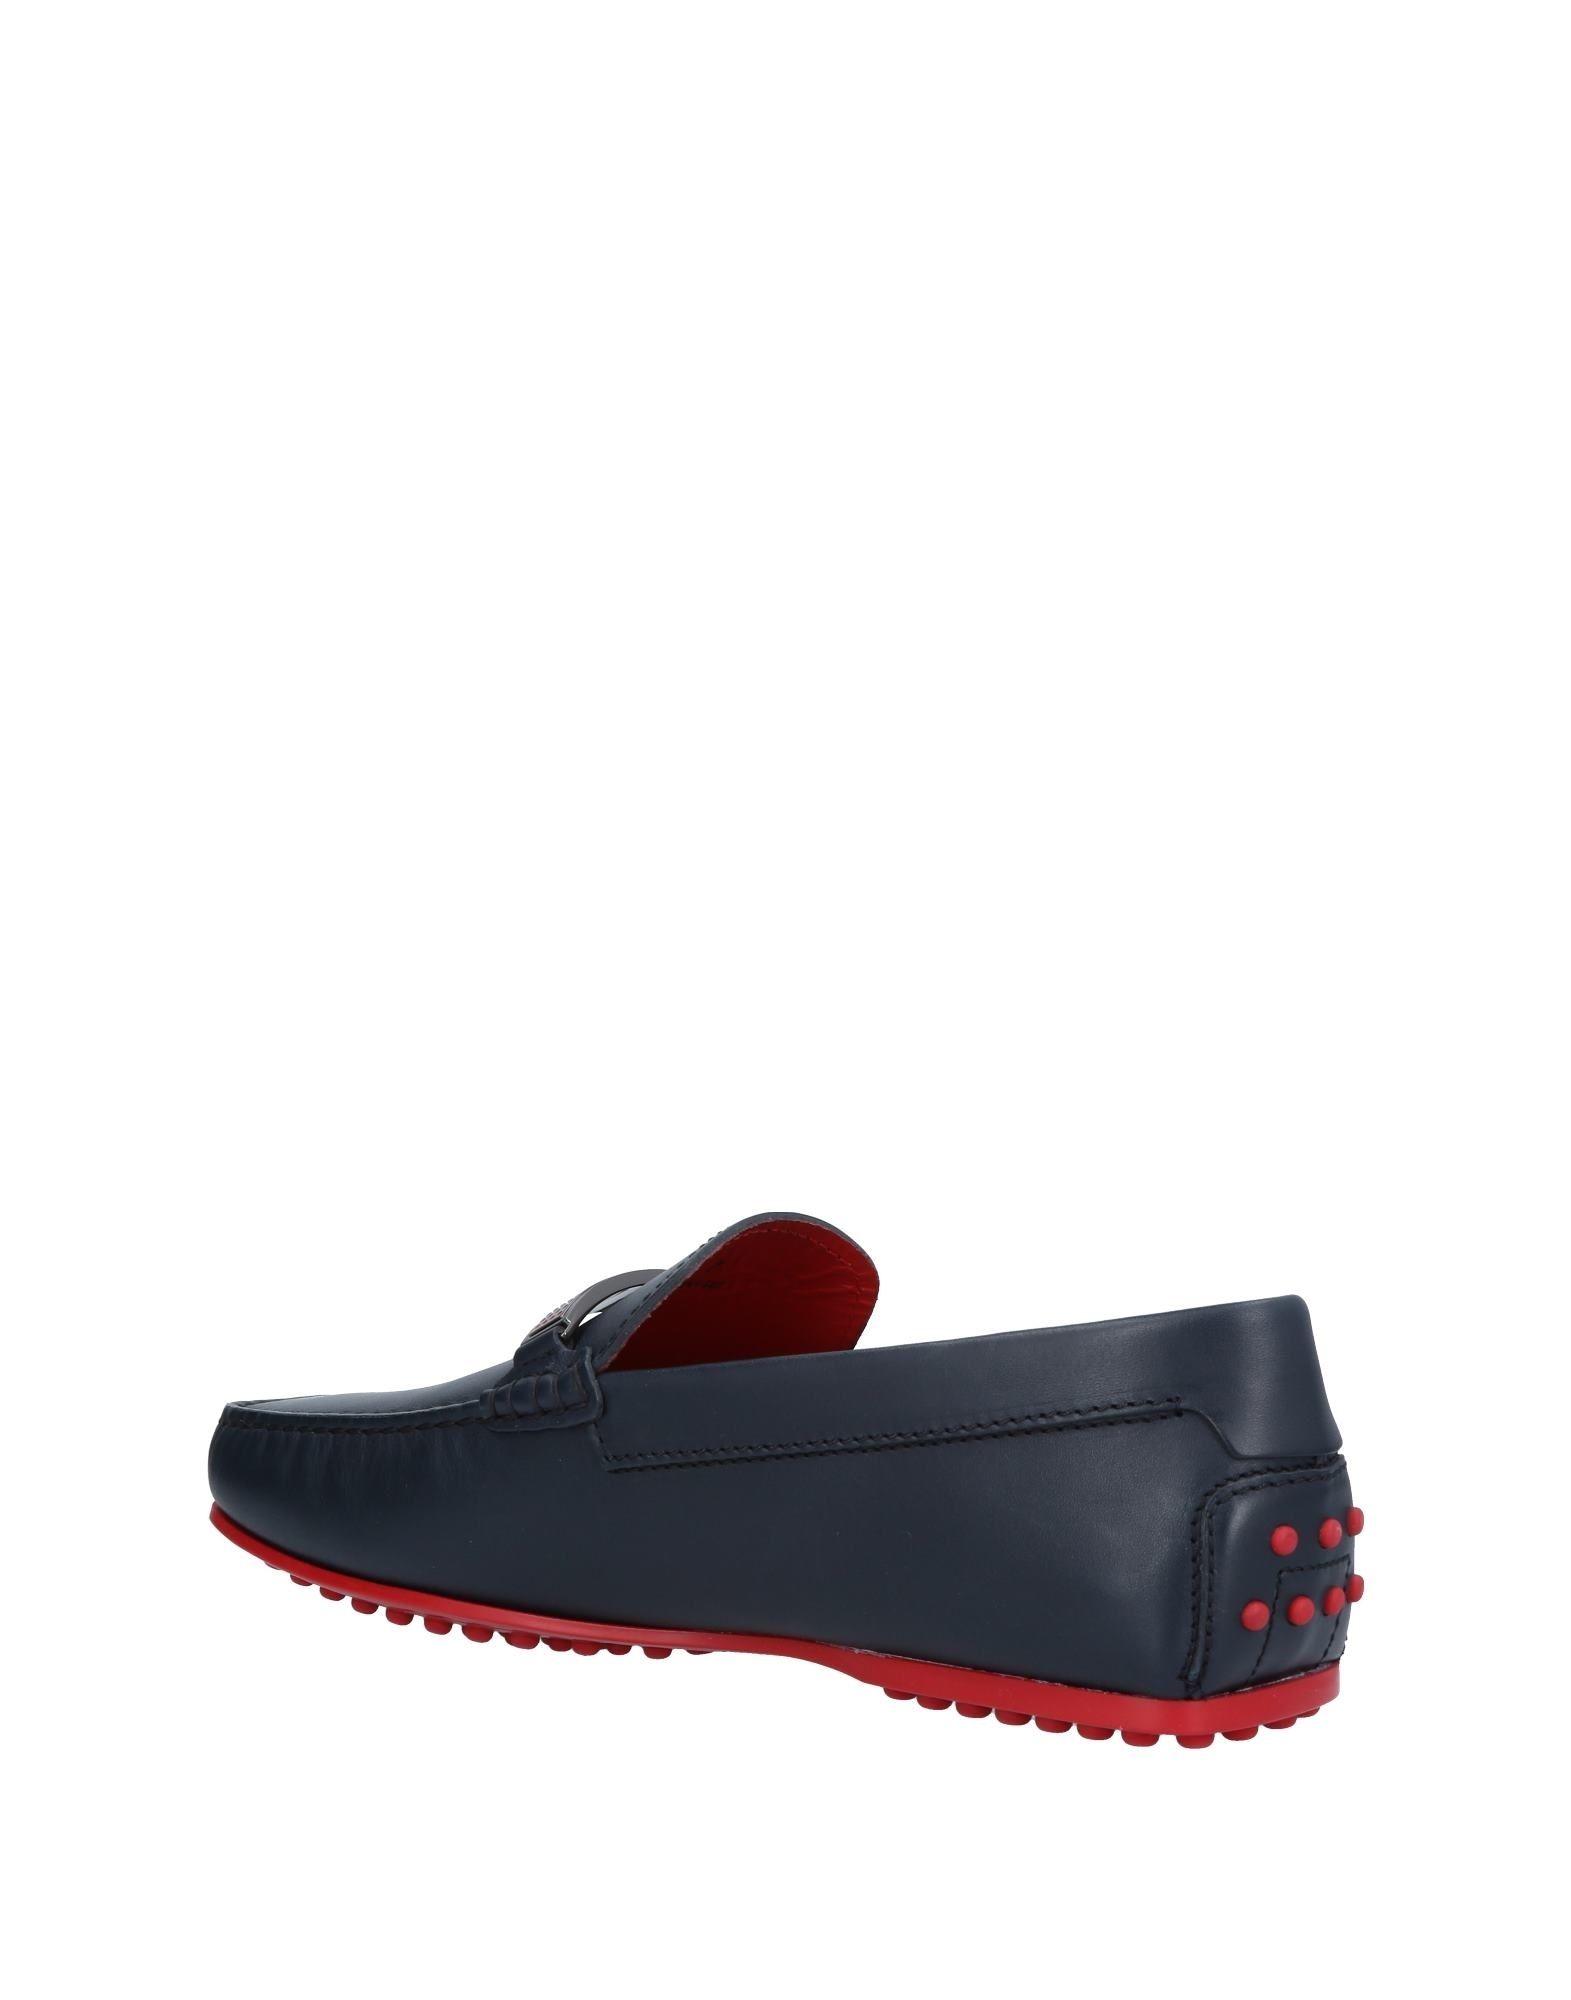 Tod's For Ferrari Mokassins Herren  11436254DL Gute Qualität beliebte Schuhe